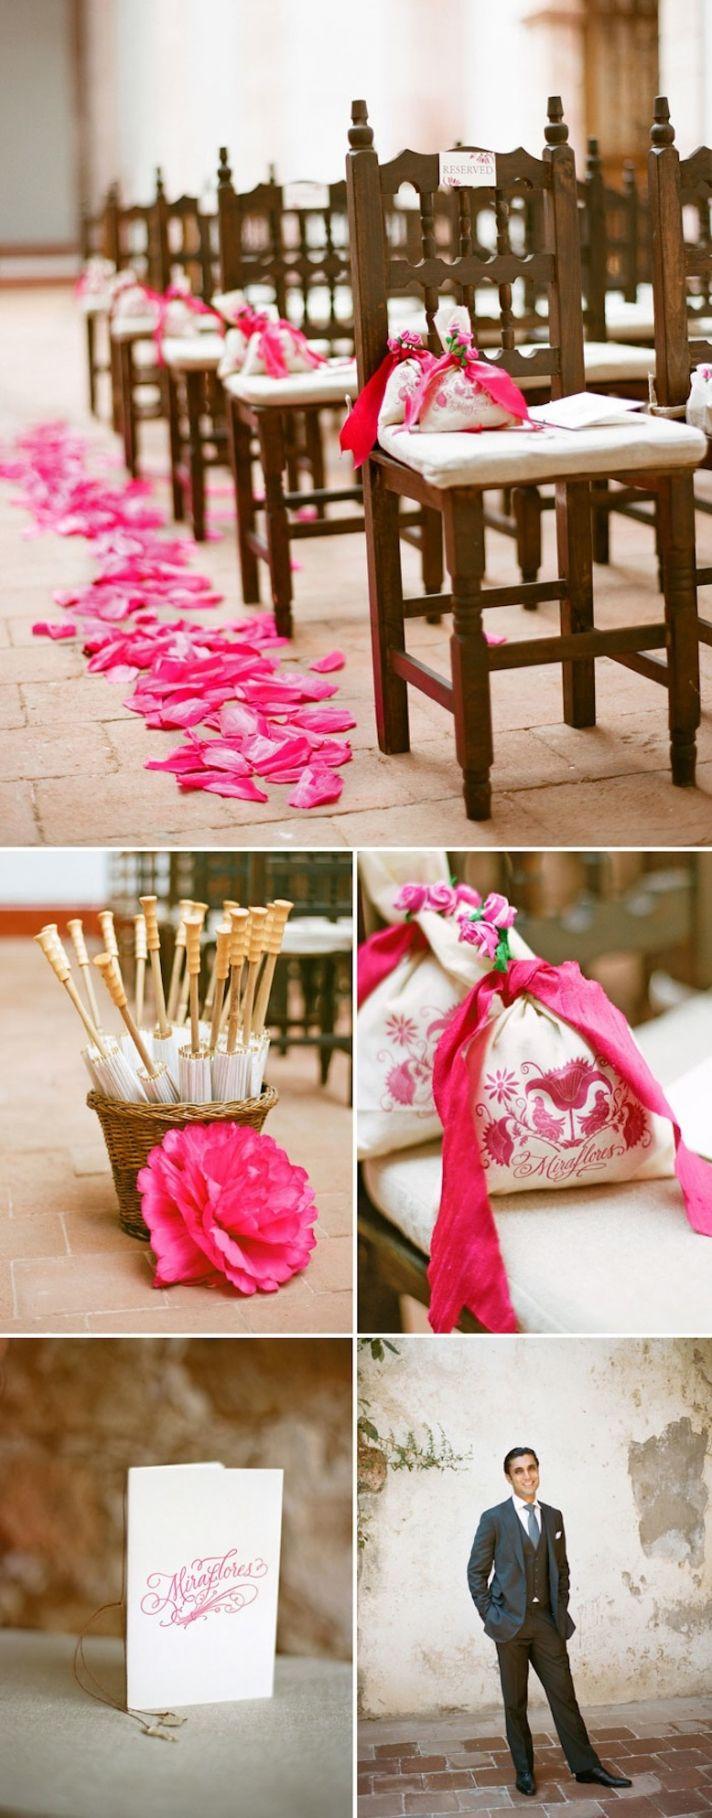 hot pink wedding ceremony decor